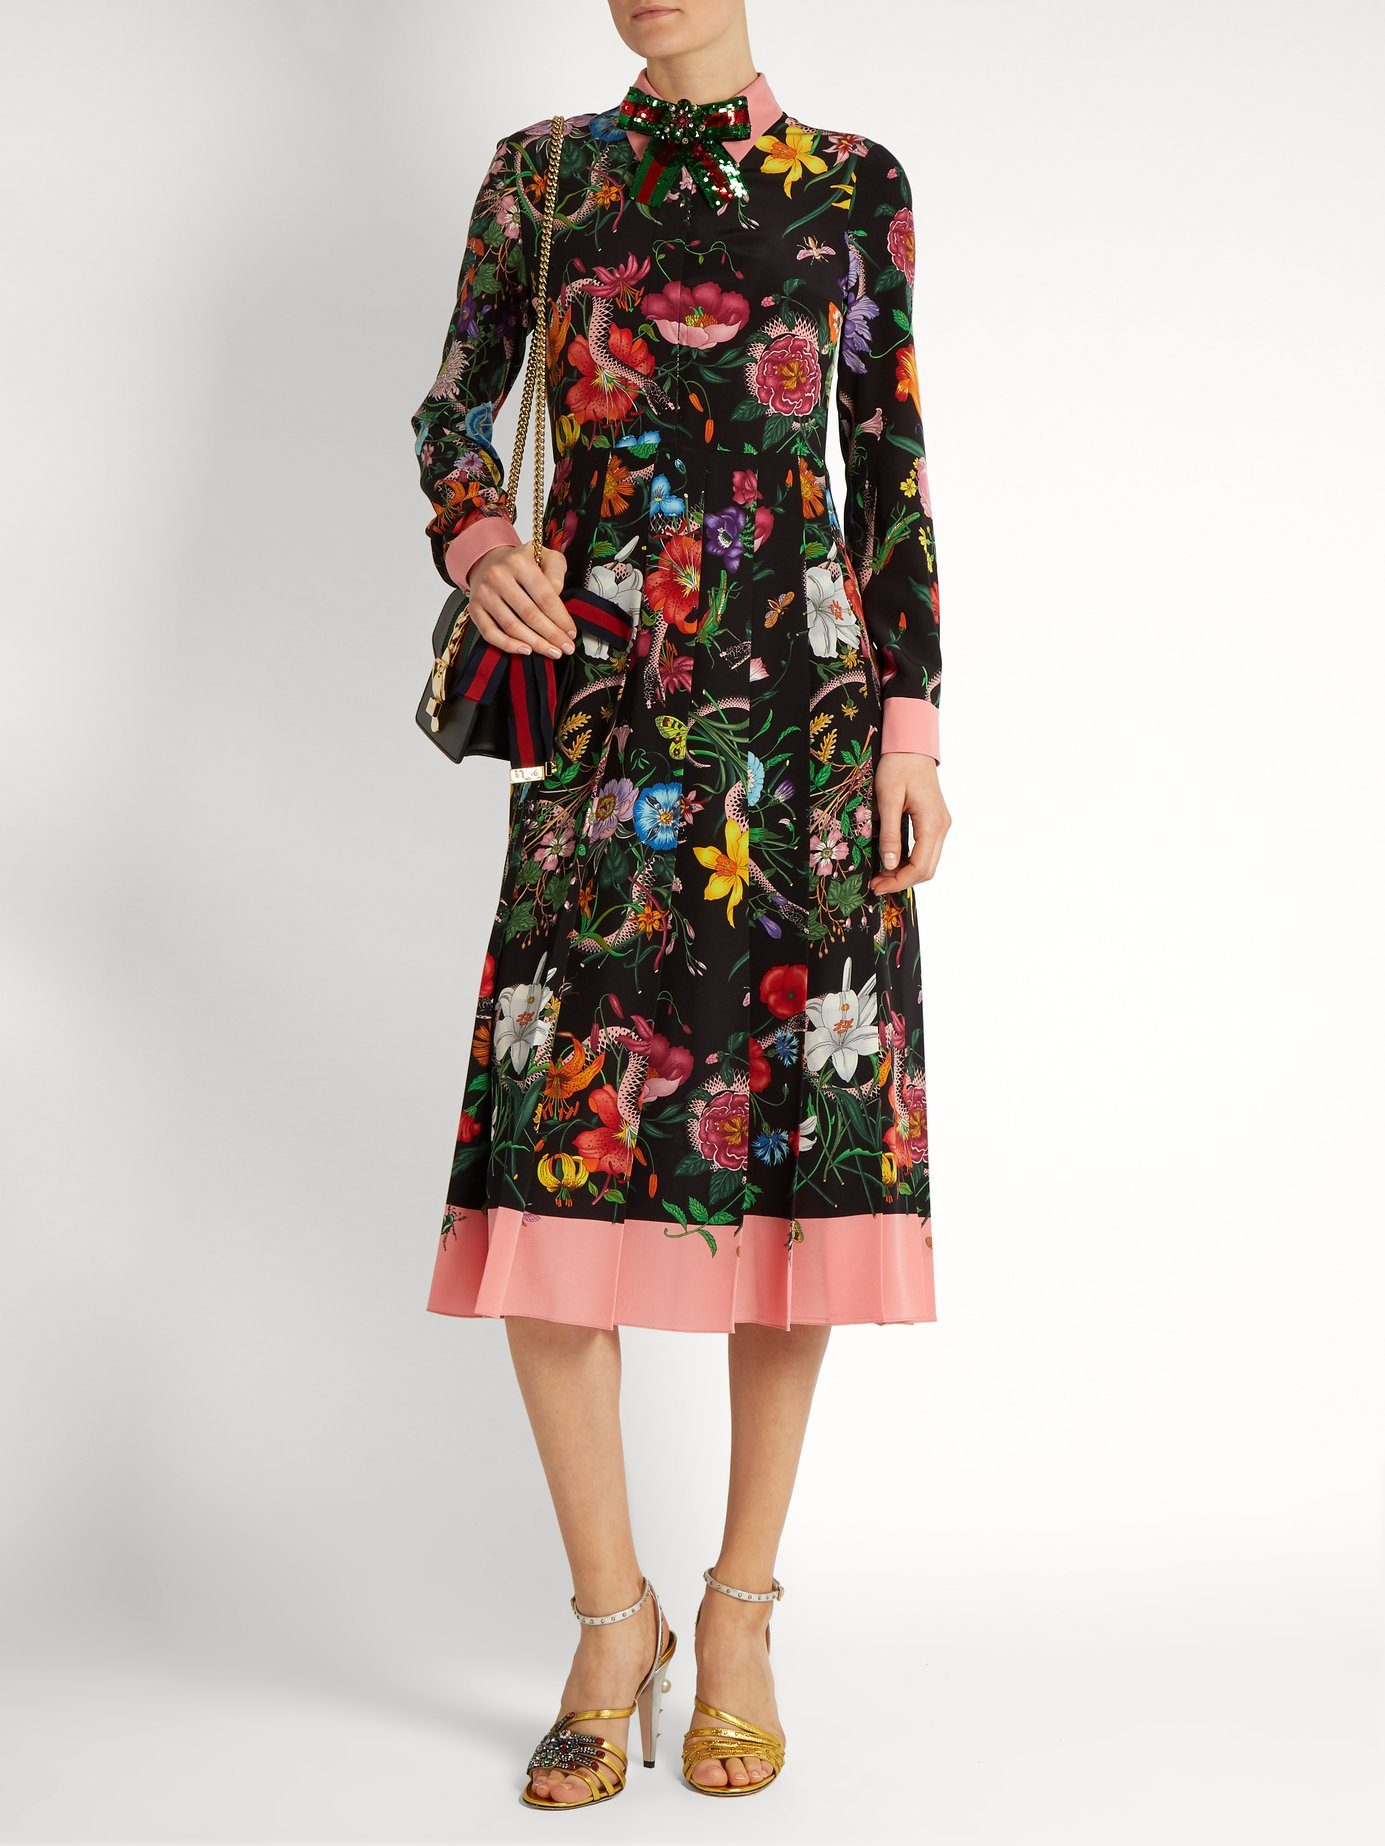 kwiatowe wzory na pokazach mody na 2018